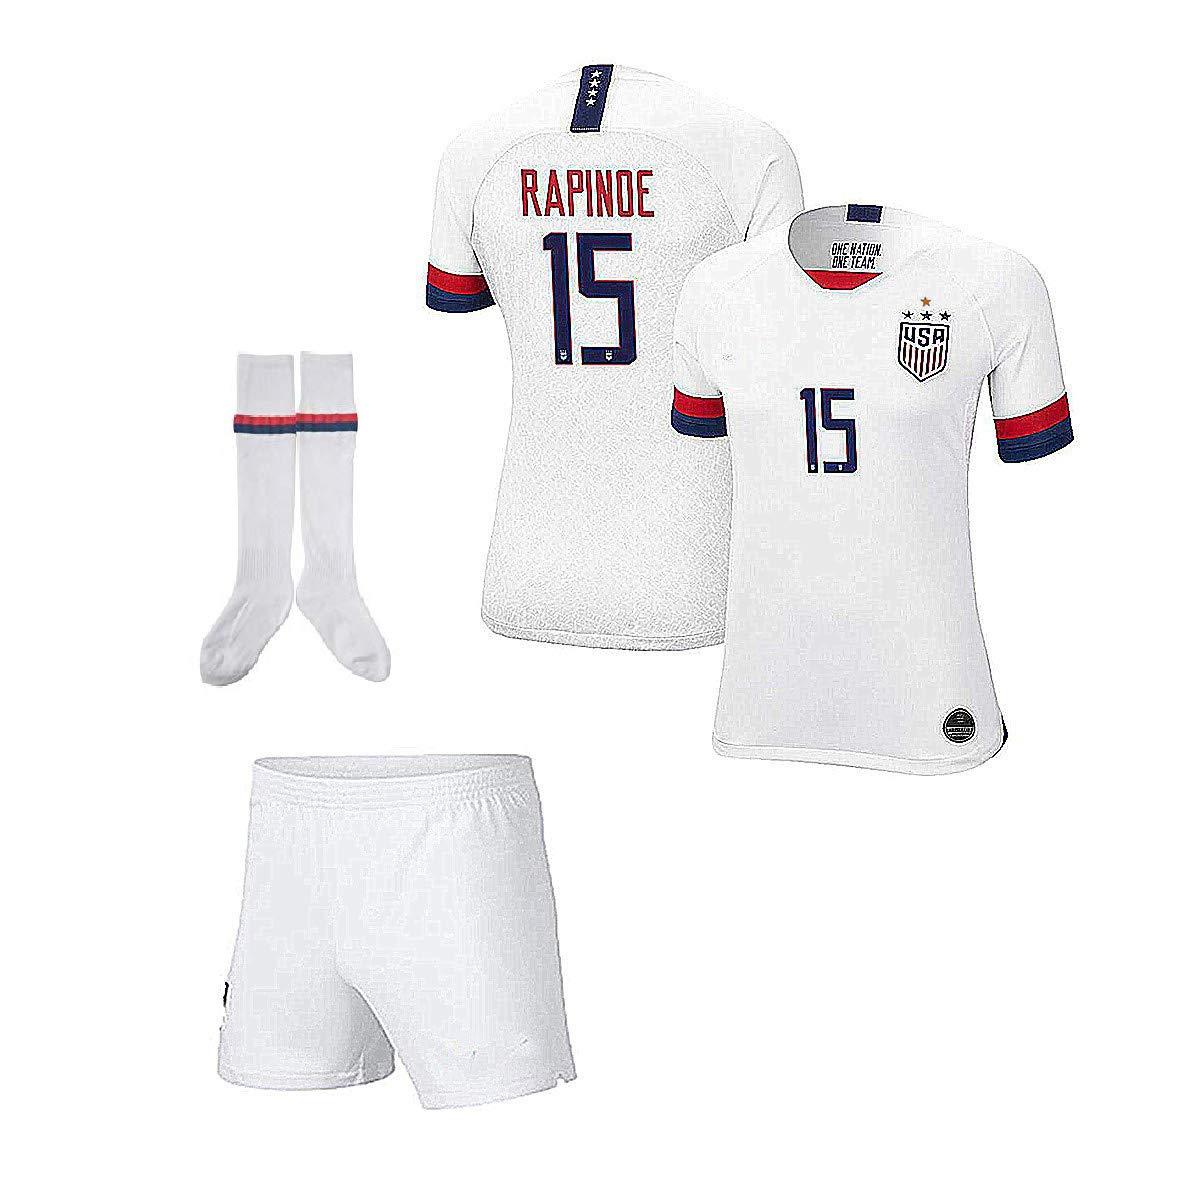 LiyiuEETY Player Jersey 2019//2020 Rapinoe #15 USA Home Soccer Jersey Shorts /& Socks for Lucky Boys